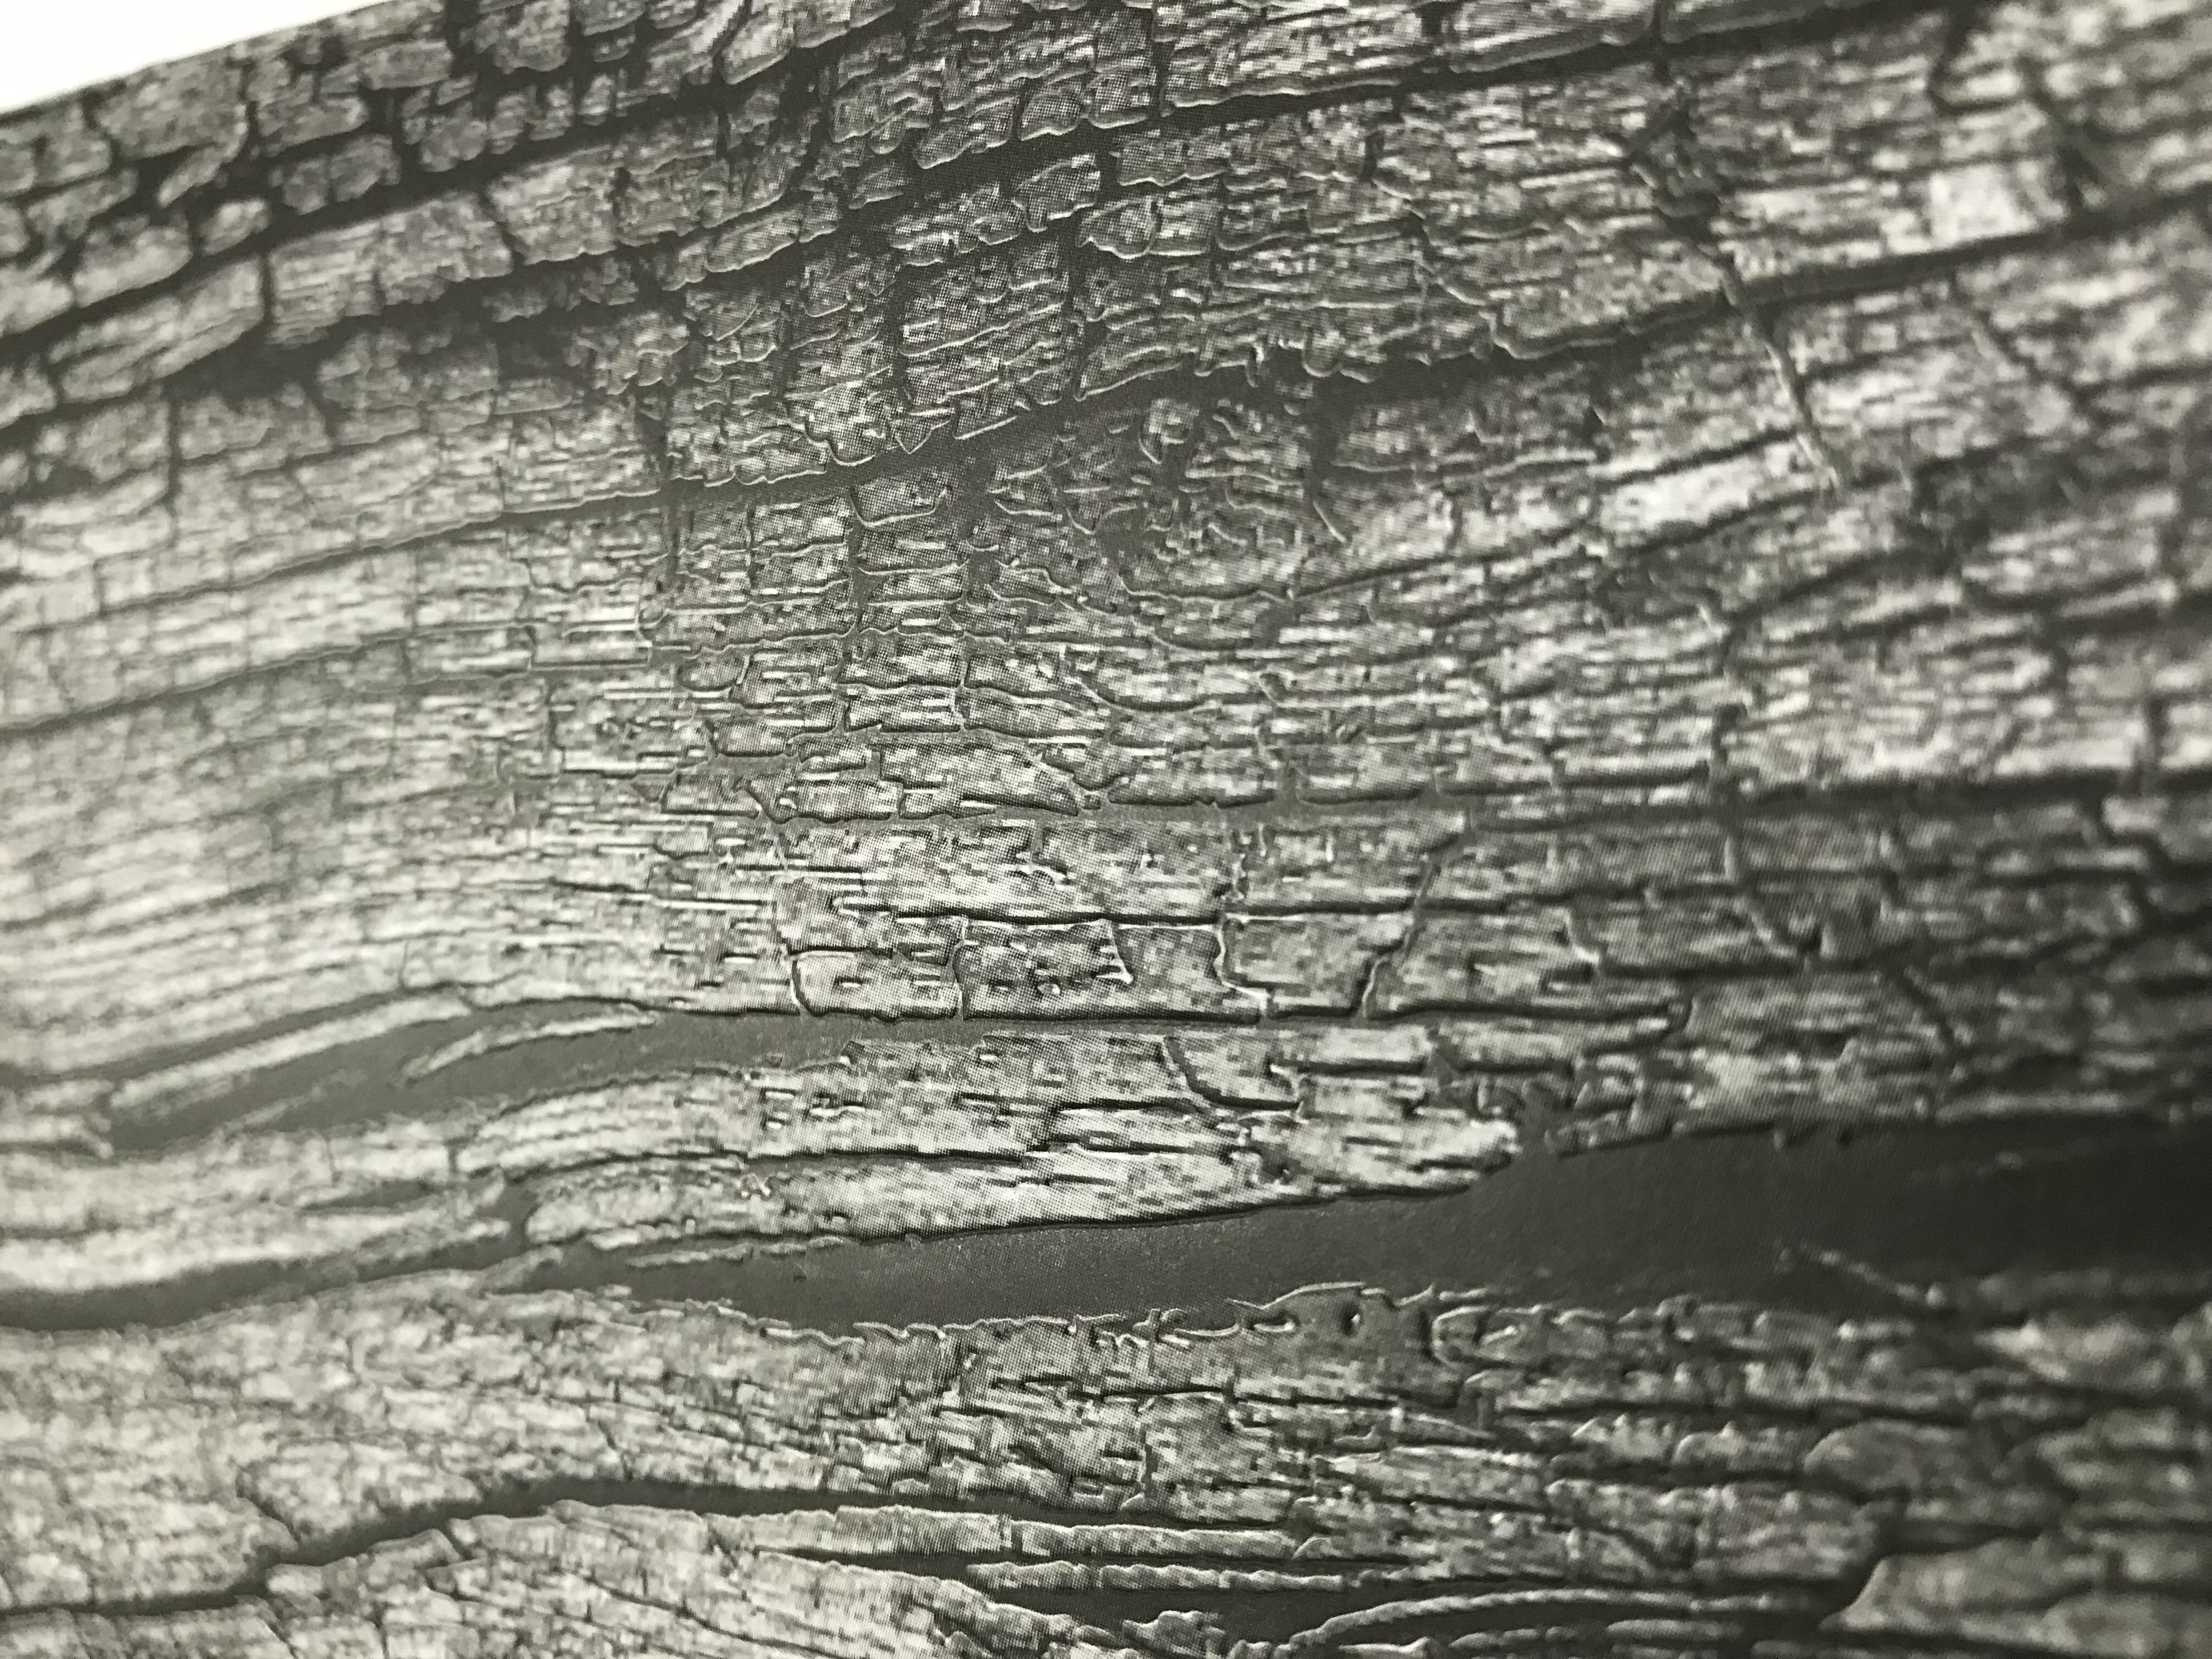 Litho Printed, Matt Laminated & Debossed To Give An Amazing Wood Finish